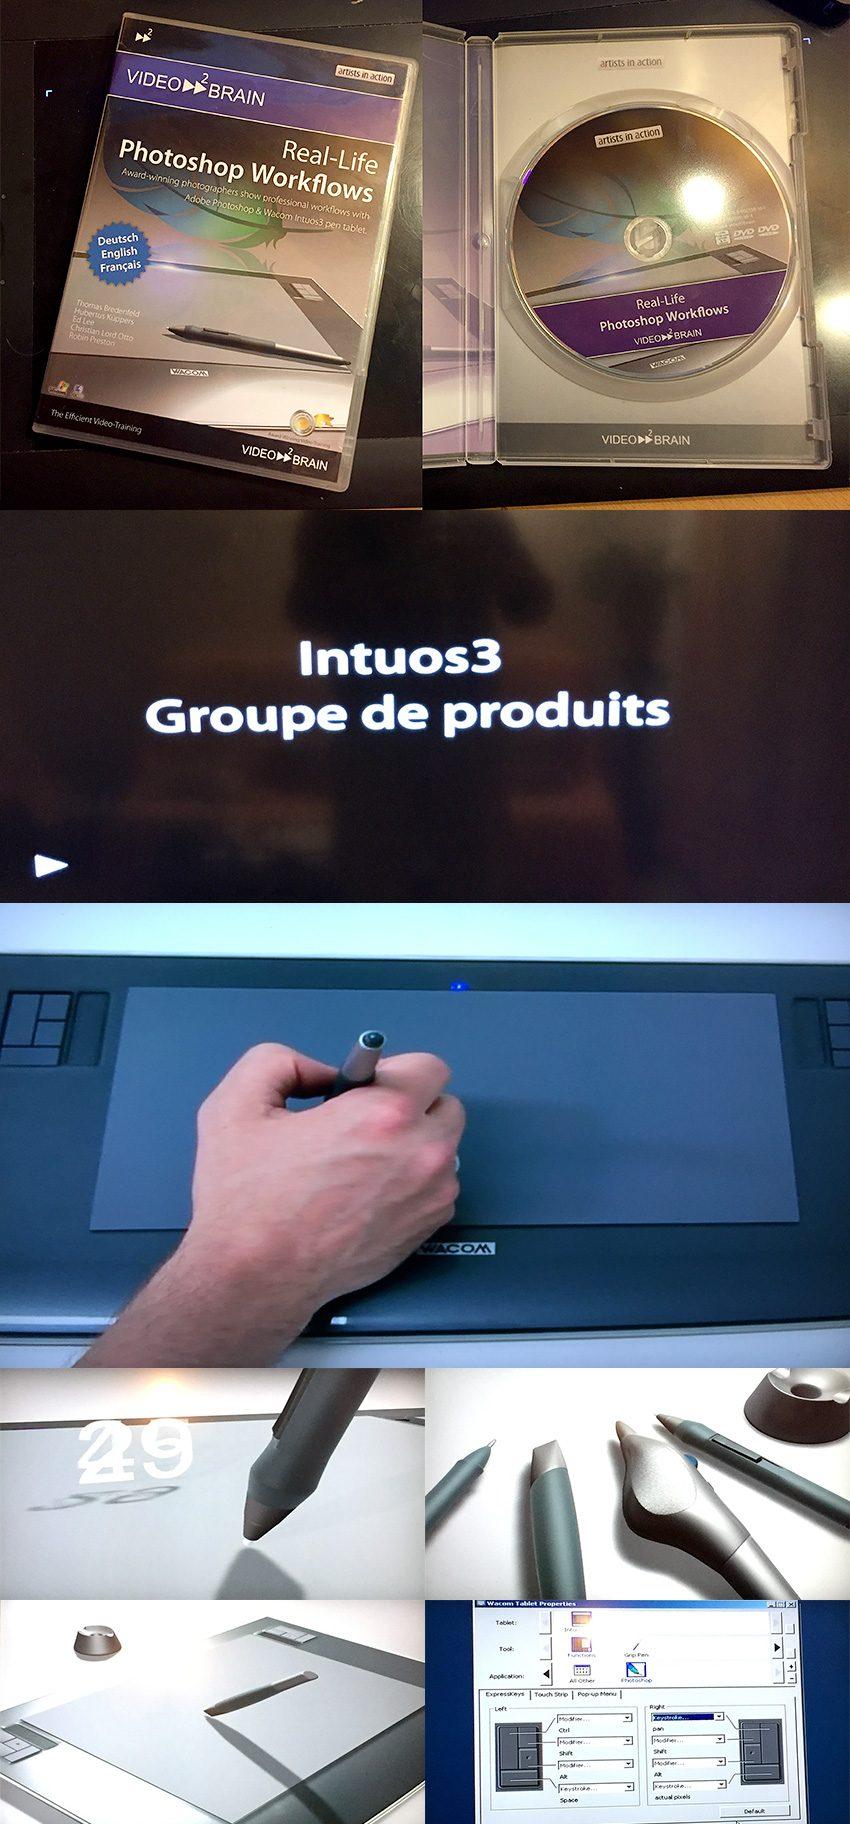 intuos3video